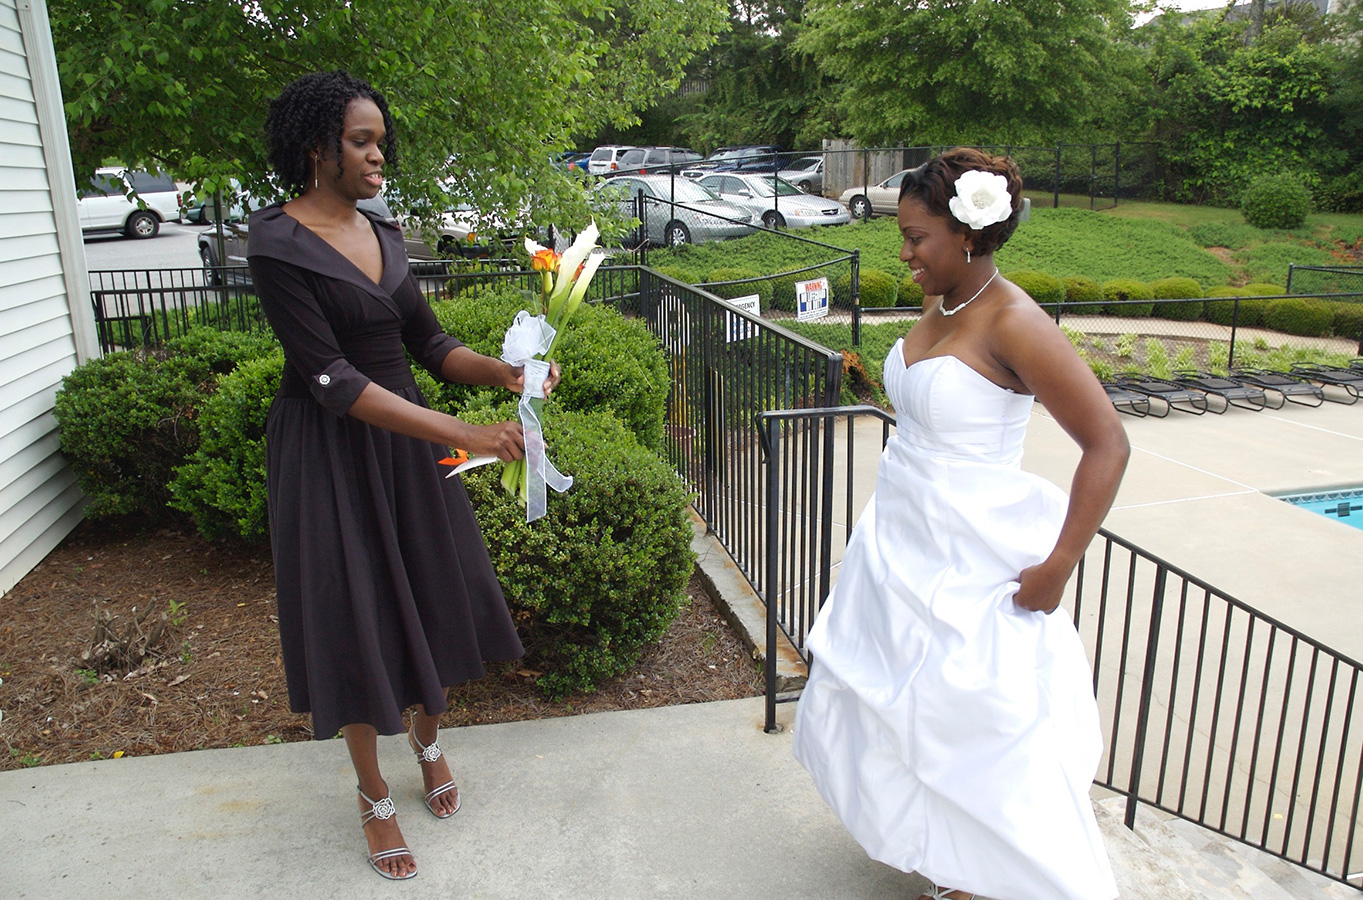 an-initimate-affair-kadians-wedding-5.jpg